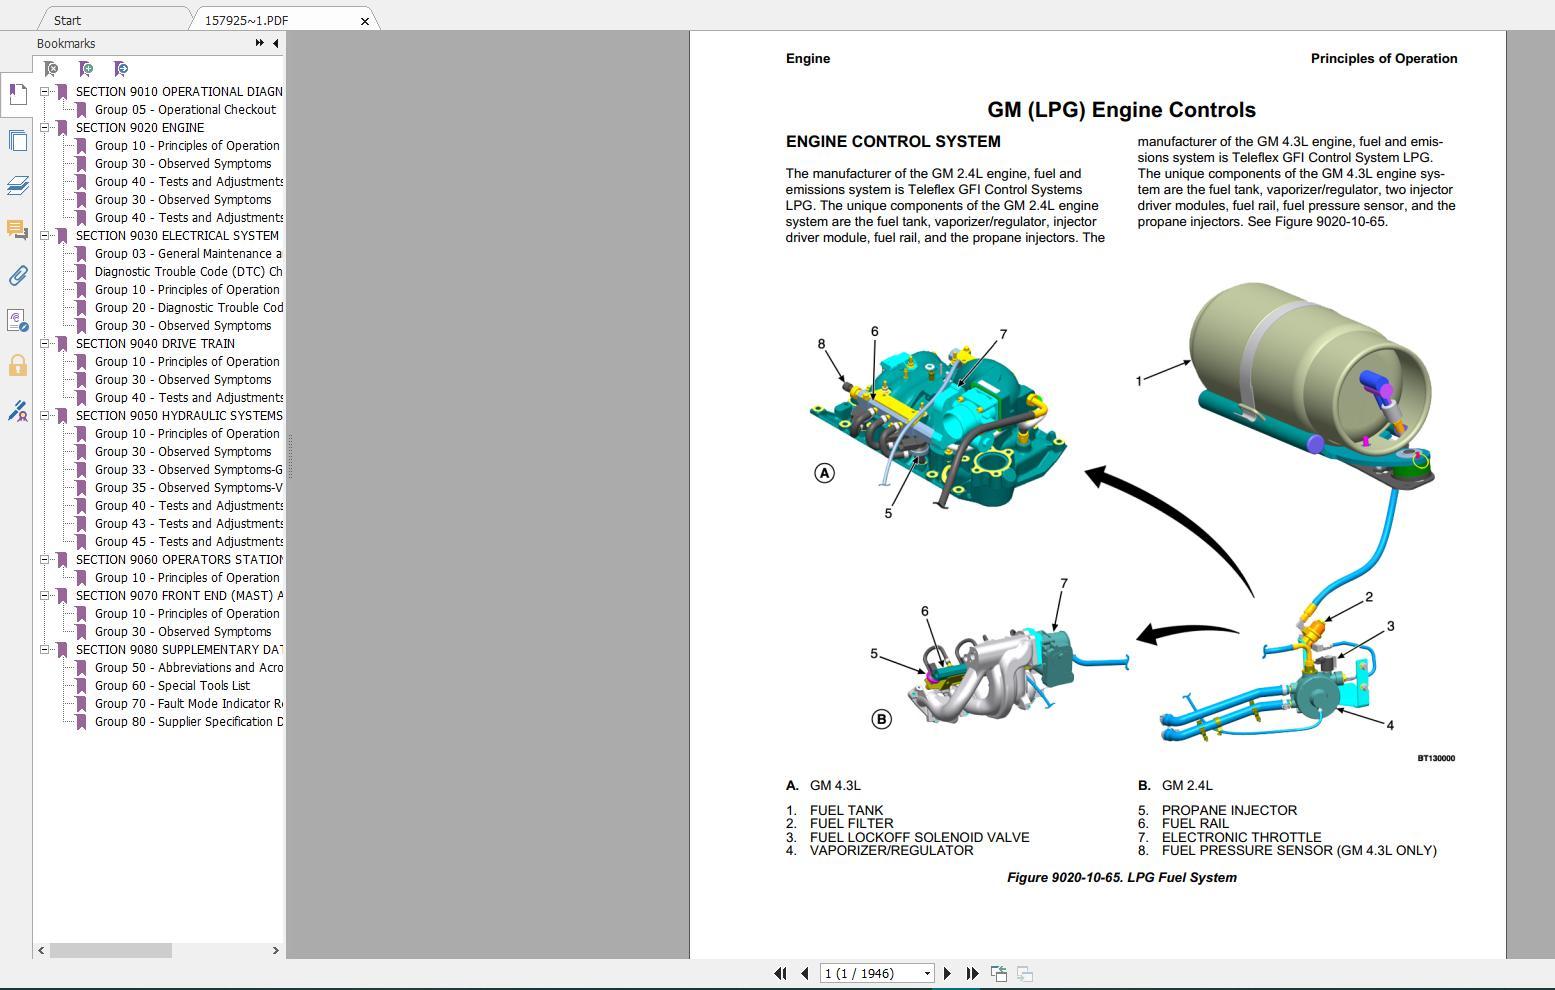 Hyster_Forklift_Class_4_Internal_Combustion_Engine_Trucks_Repair_Manuals9